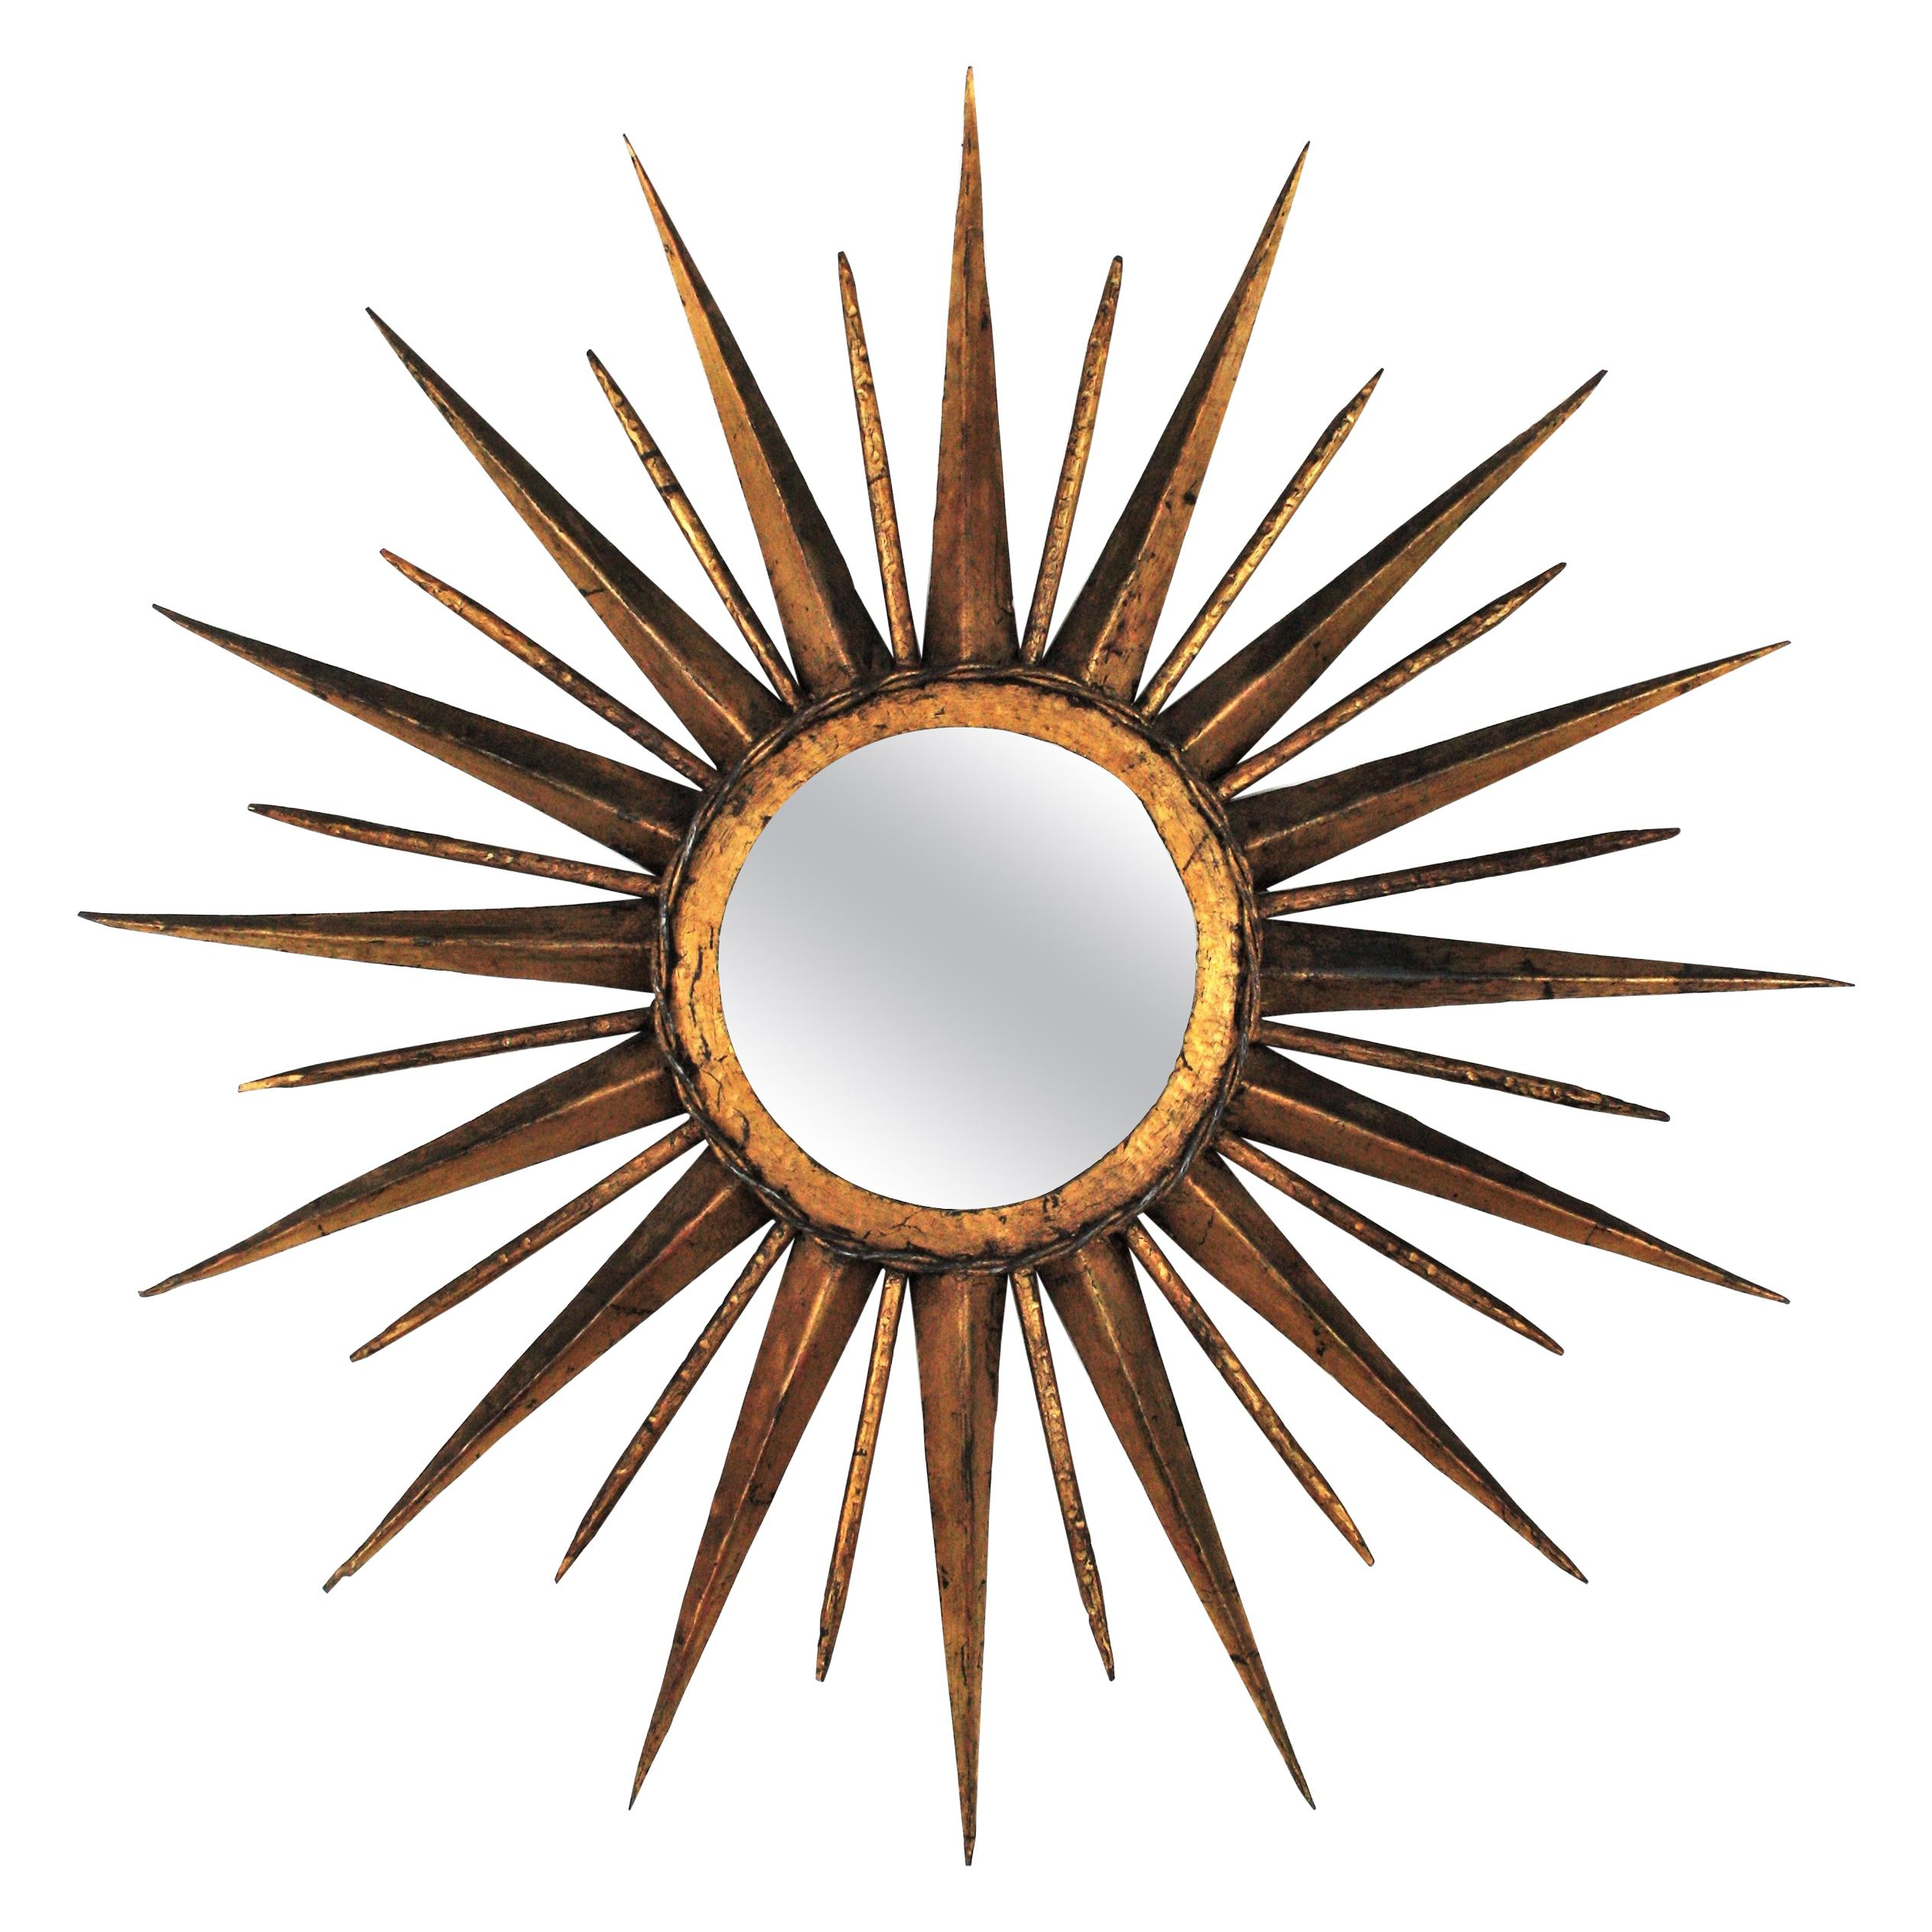 French Sunburst Starburst Mirror in Gilt Iron, Gilbert Poillerat Style